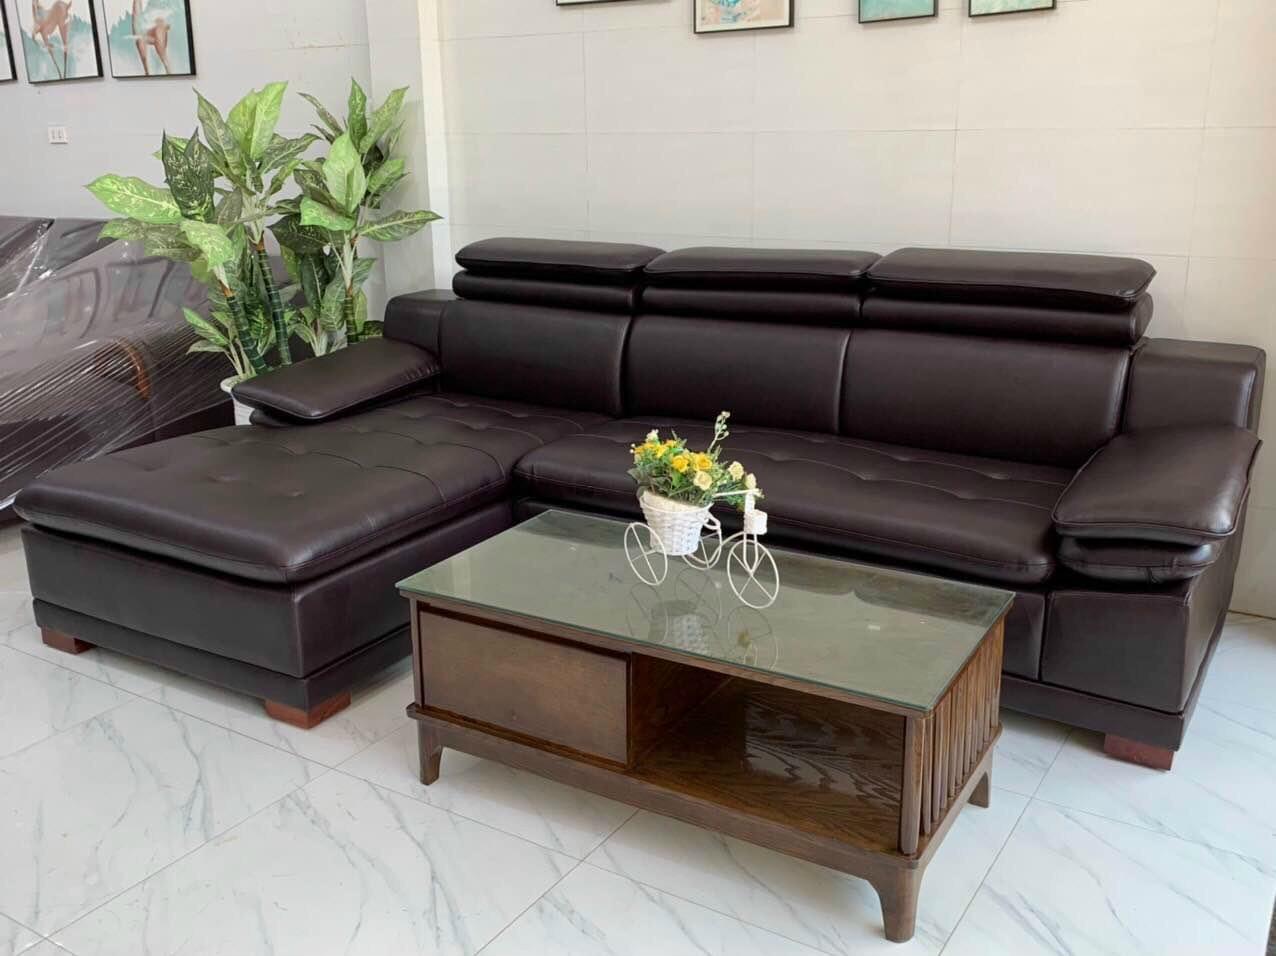 Bảo dưỡng ghế sofa da tại nhà